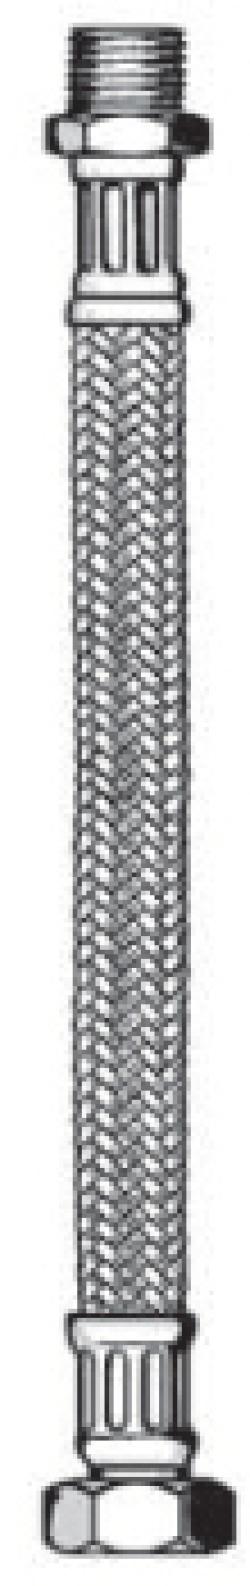 МЕ 5625.1127.60 Meiflex Dn18, 3/4 BPx3/4HP, 600mm